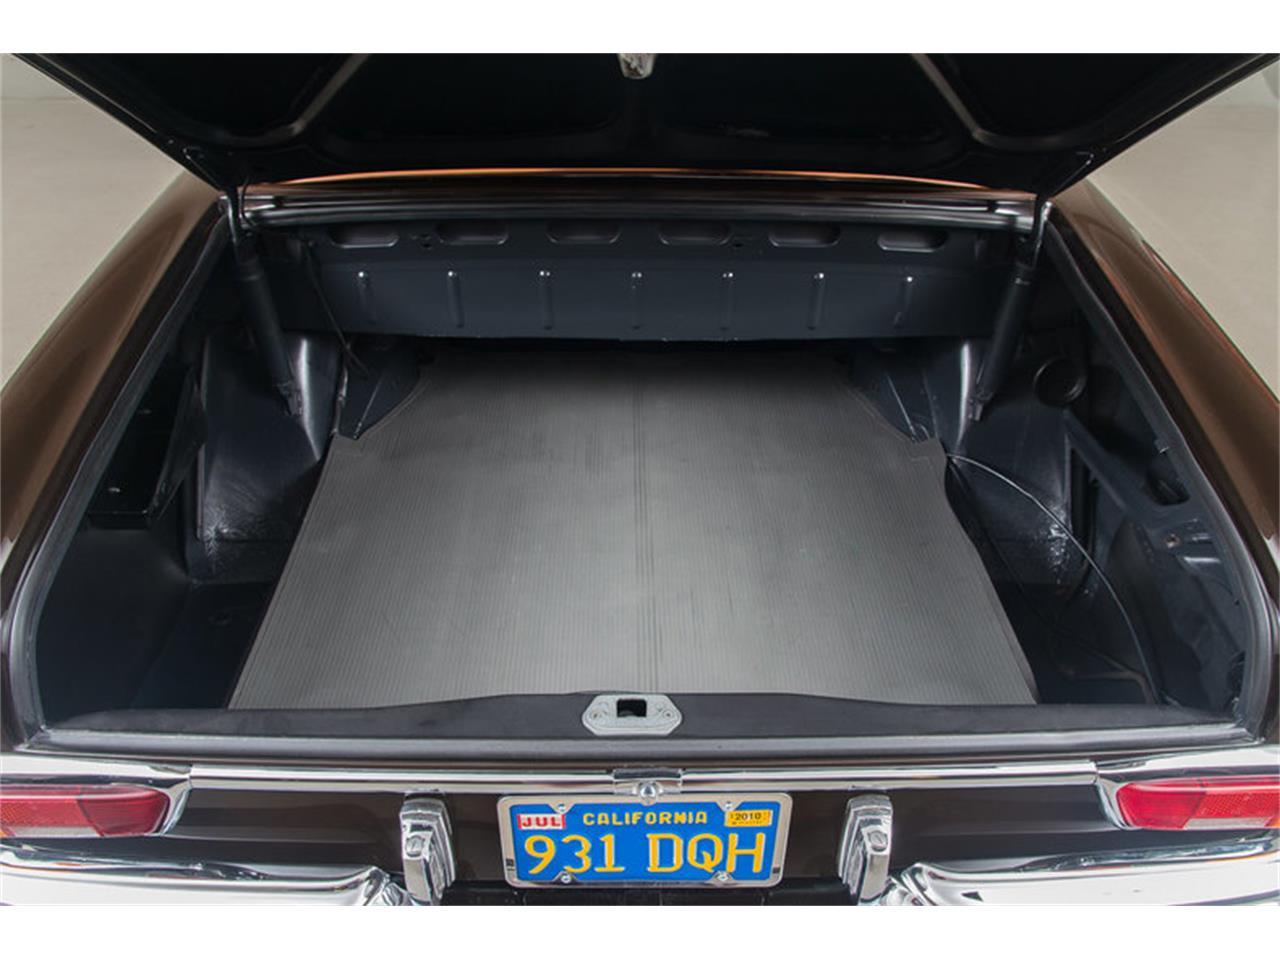 Large Picture of Classic '71 Mercedes-Benz 280 SE 3.5 Cabriolet Auction Vehicle - G0JQ